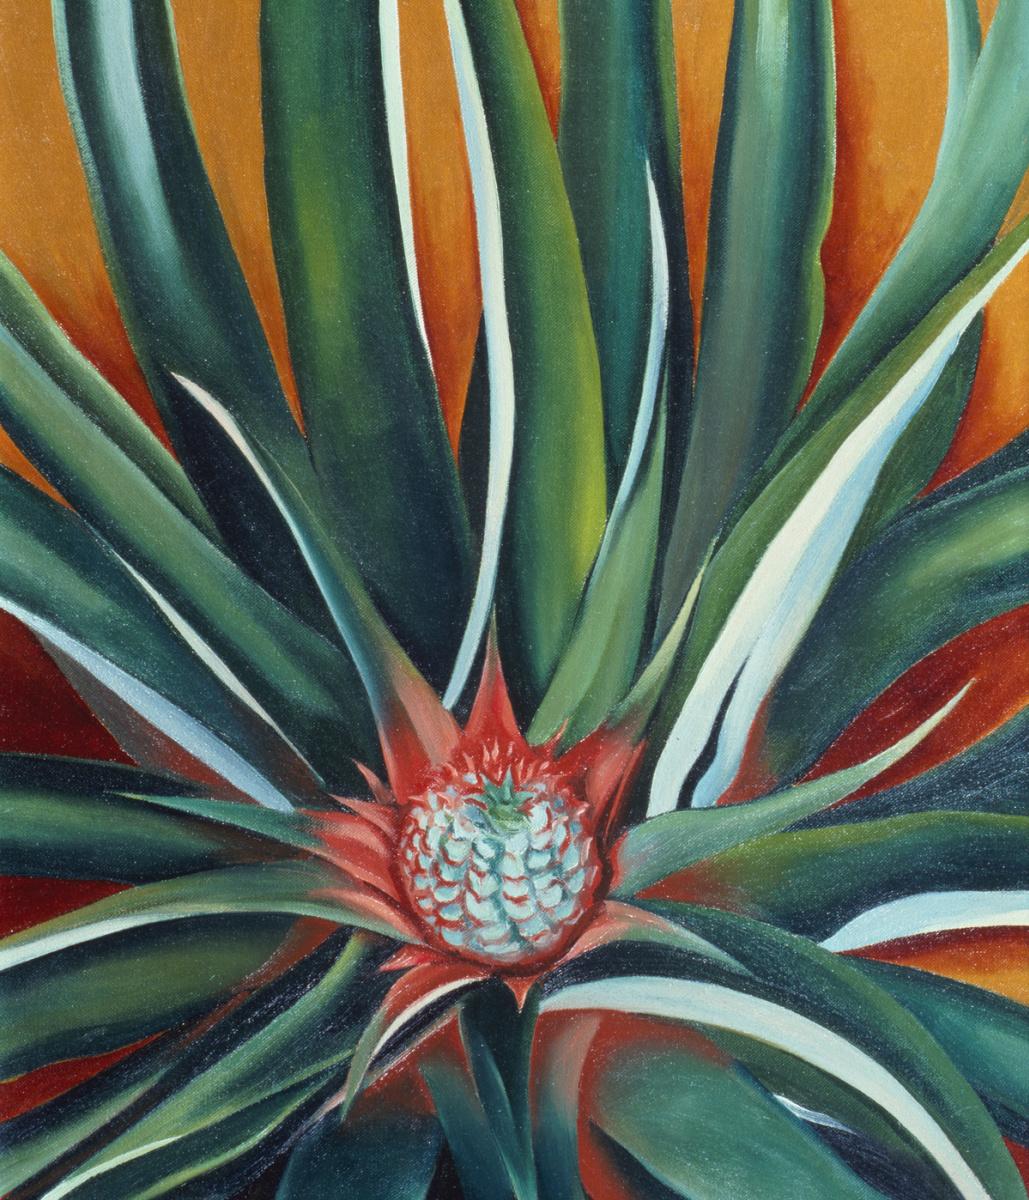 Georgia O'Keeffe. Pineapple Bud